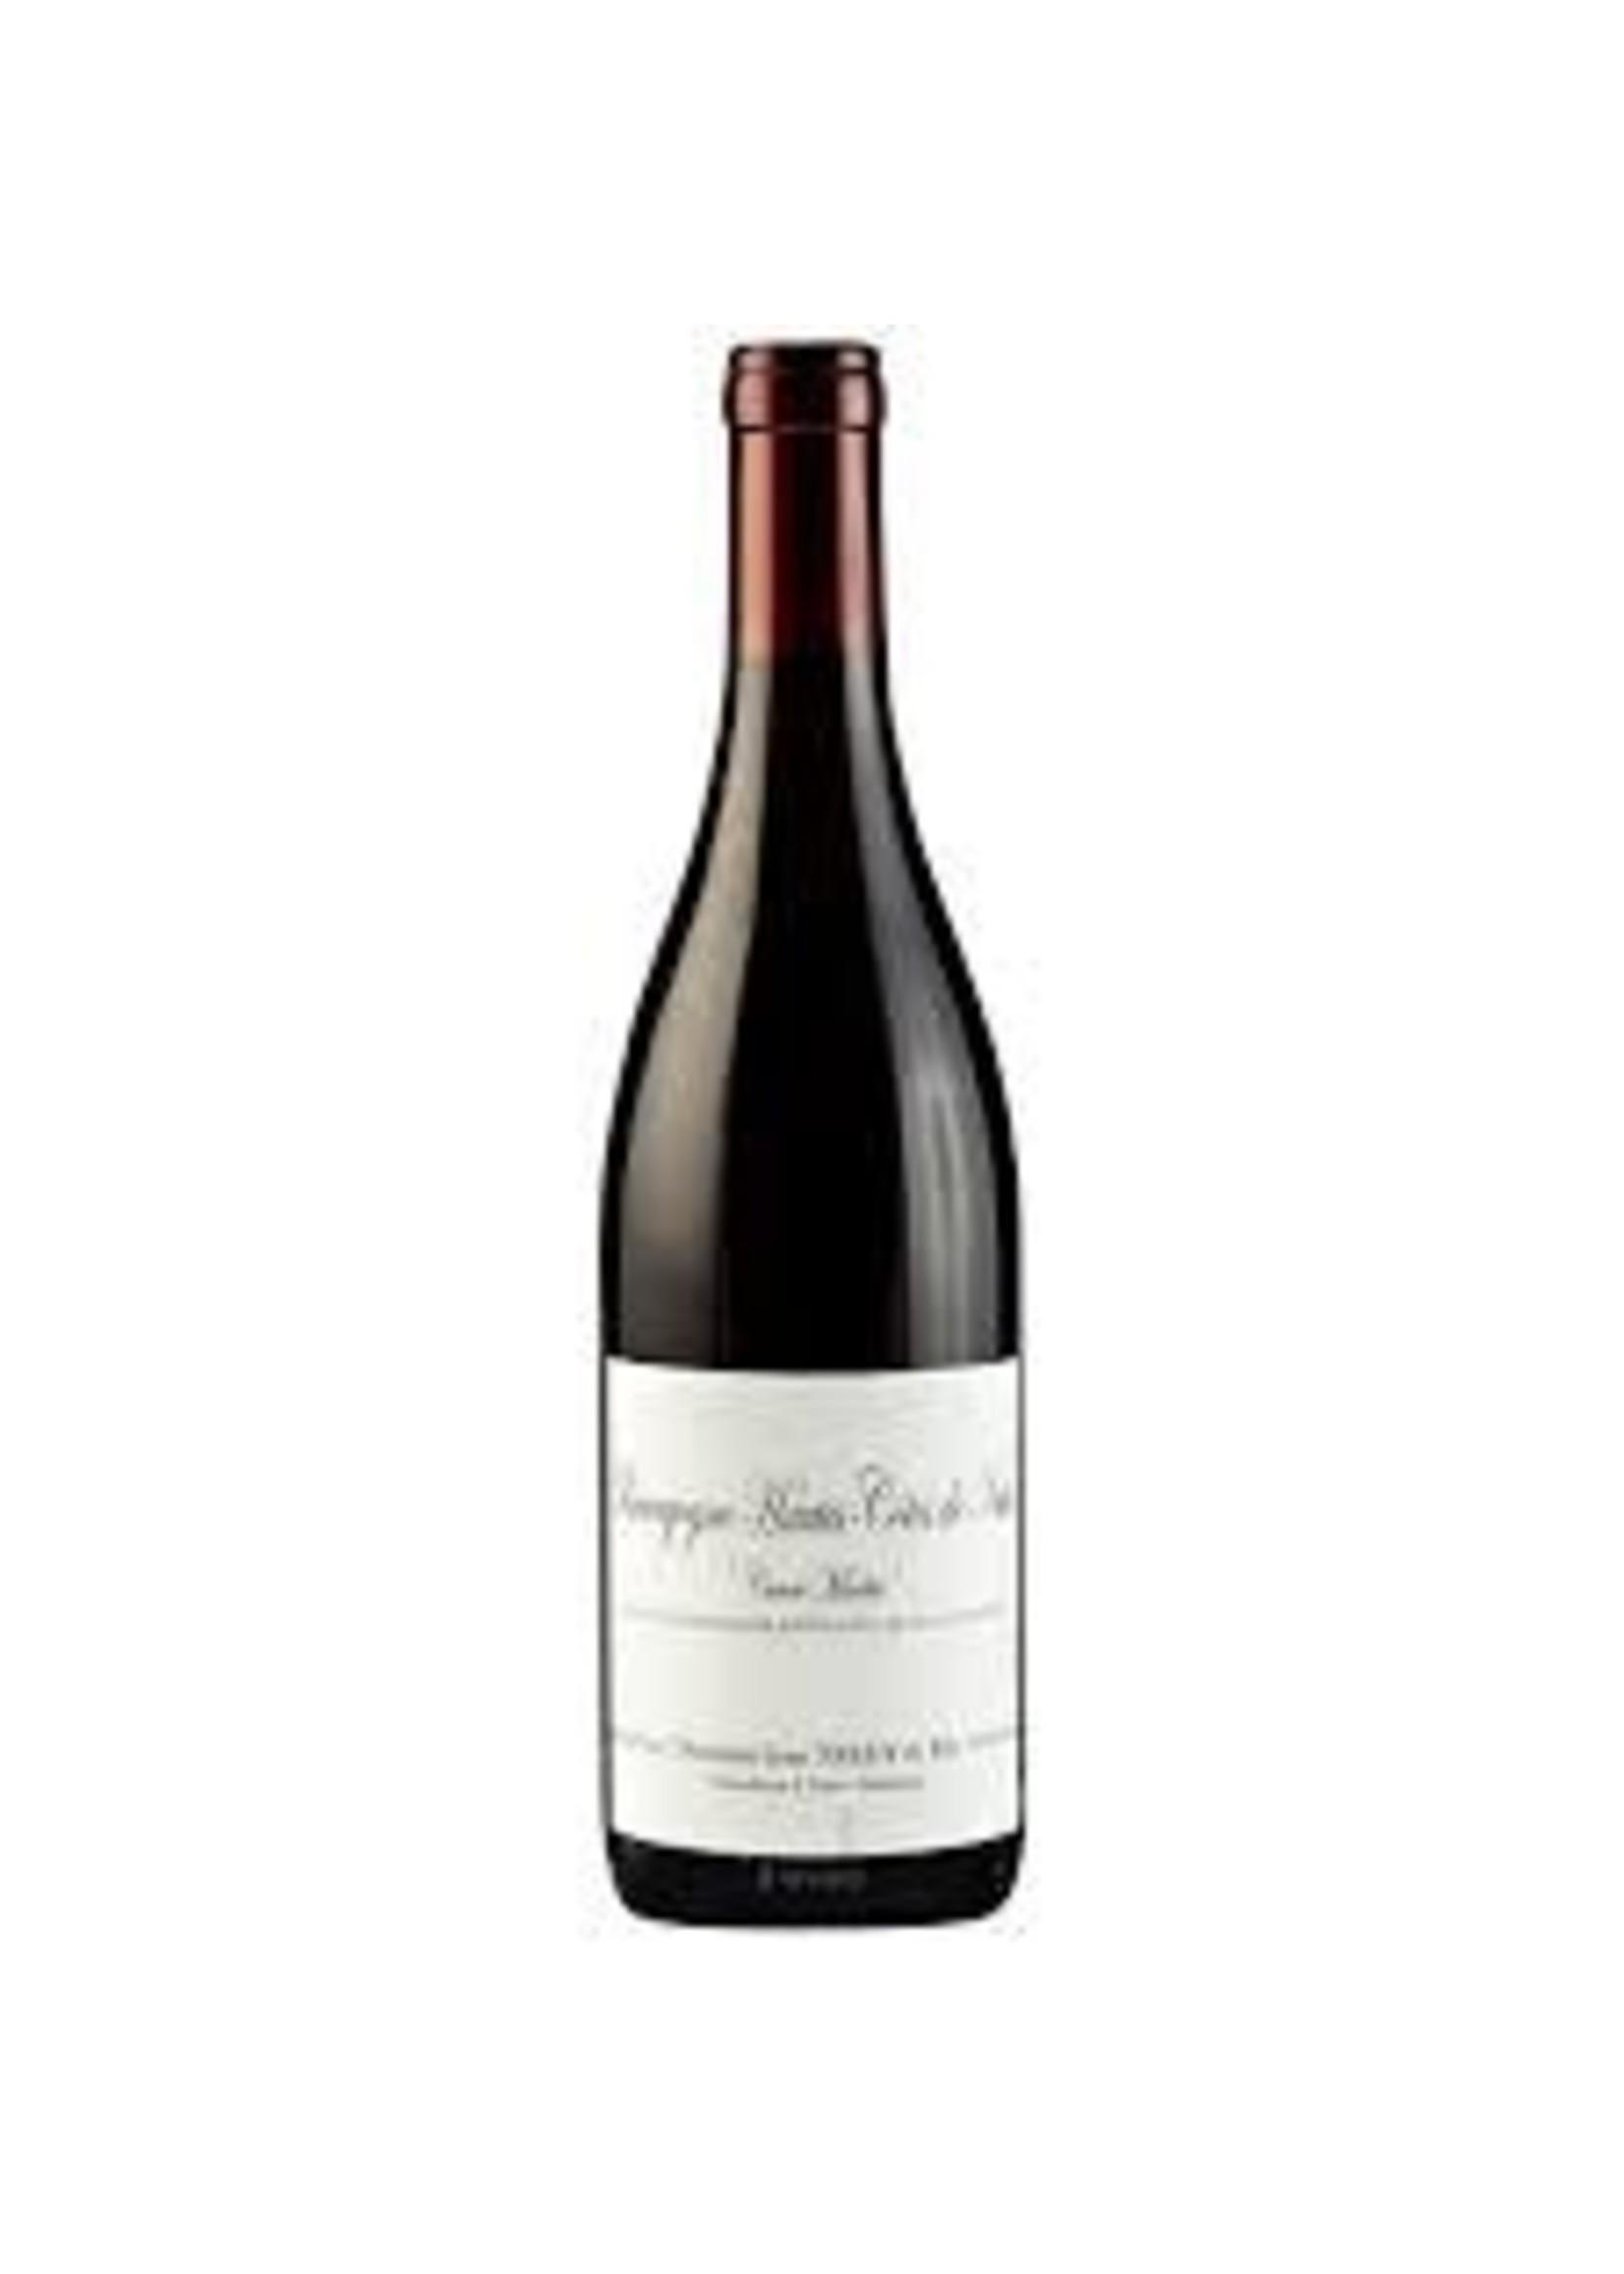 Jean Tardy 2017 Bourgogne Cuvee Maelie 750ml